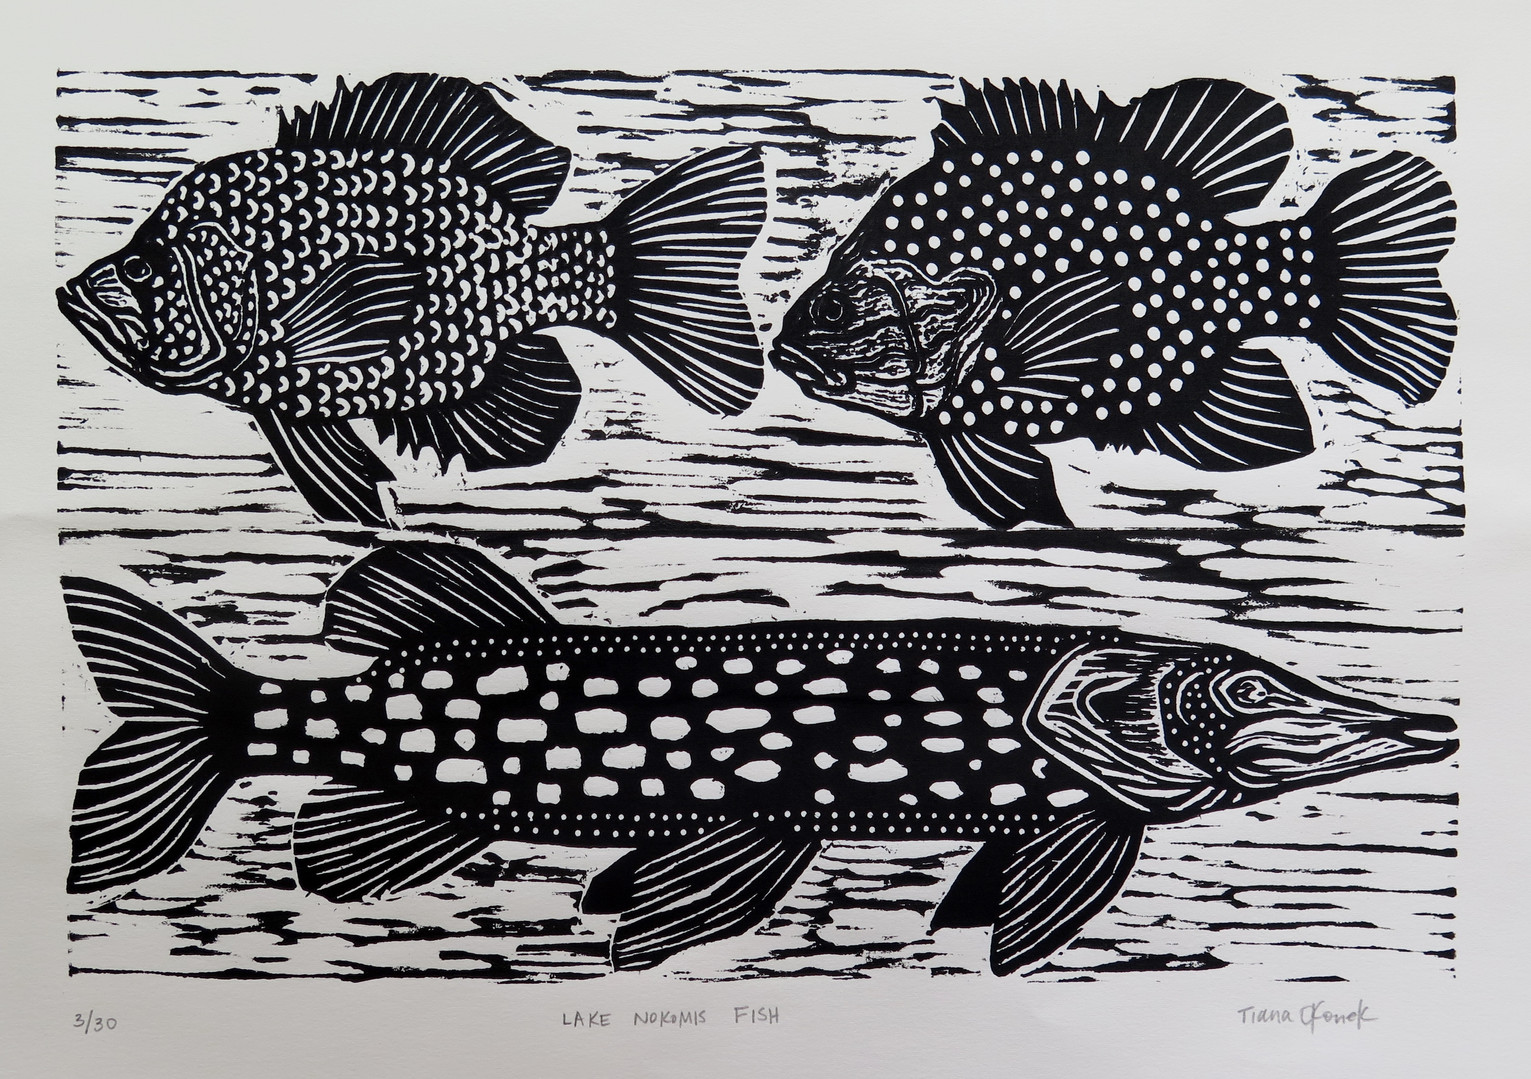 LakeNokomisFish.JPG